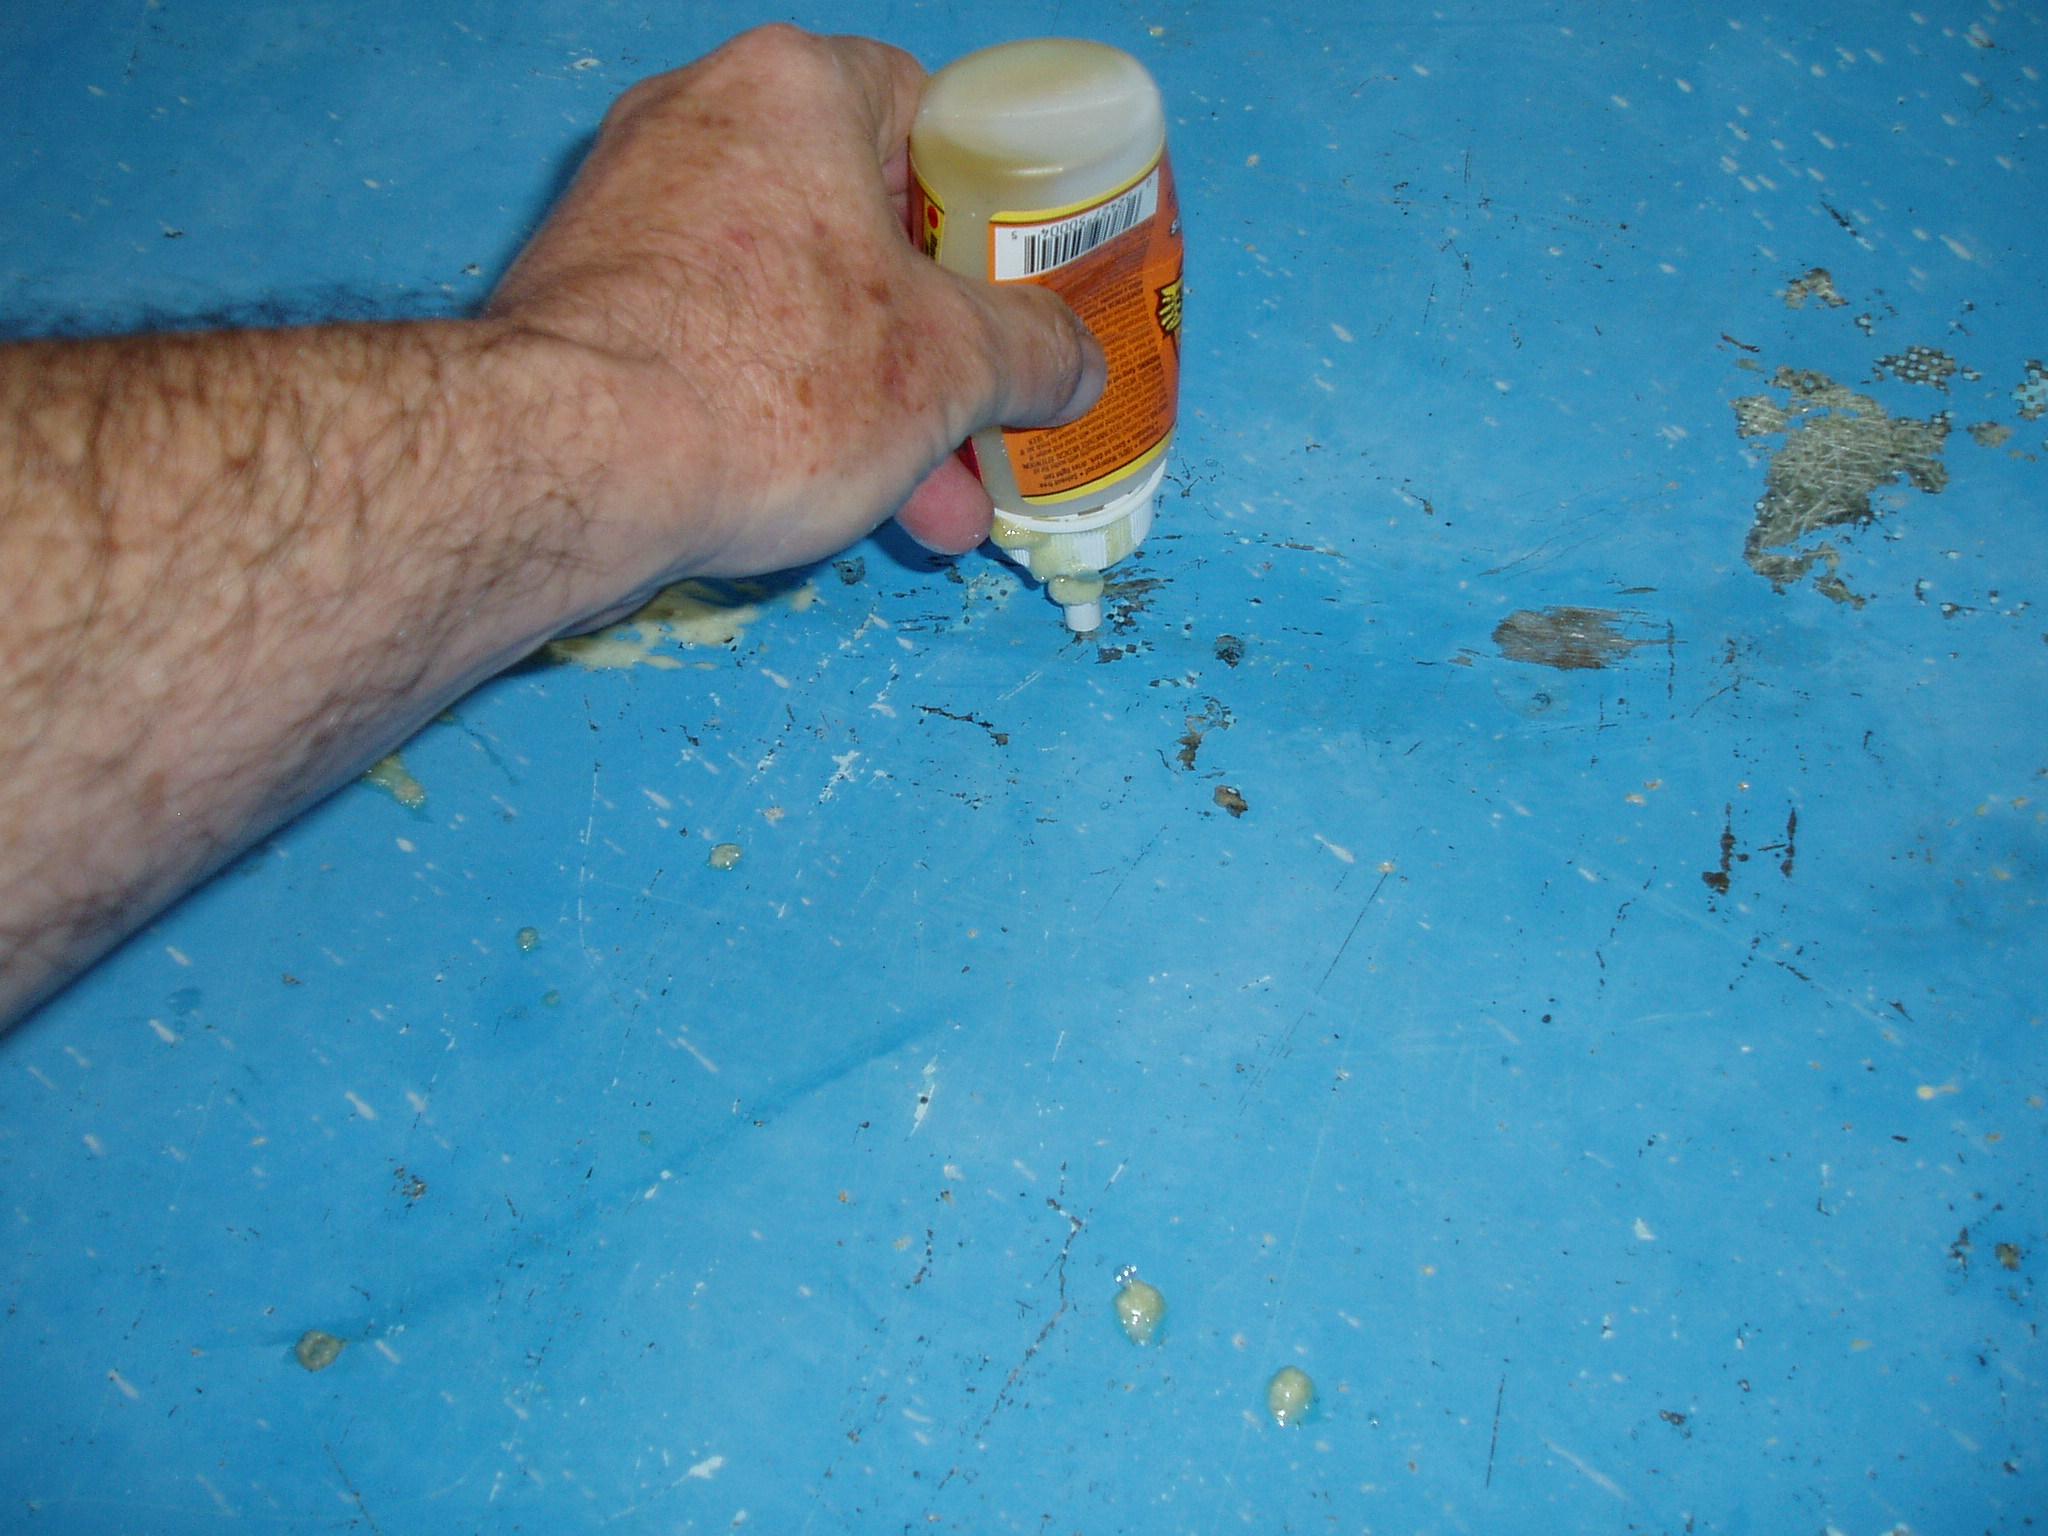 Fixing Soft Spots Or Delamination Using Gorilla Glue Or